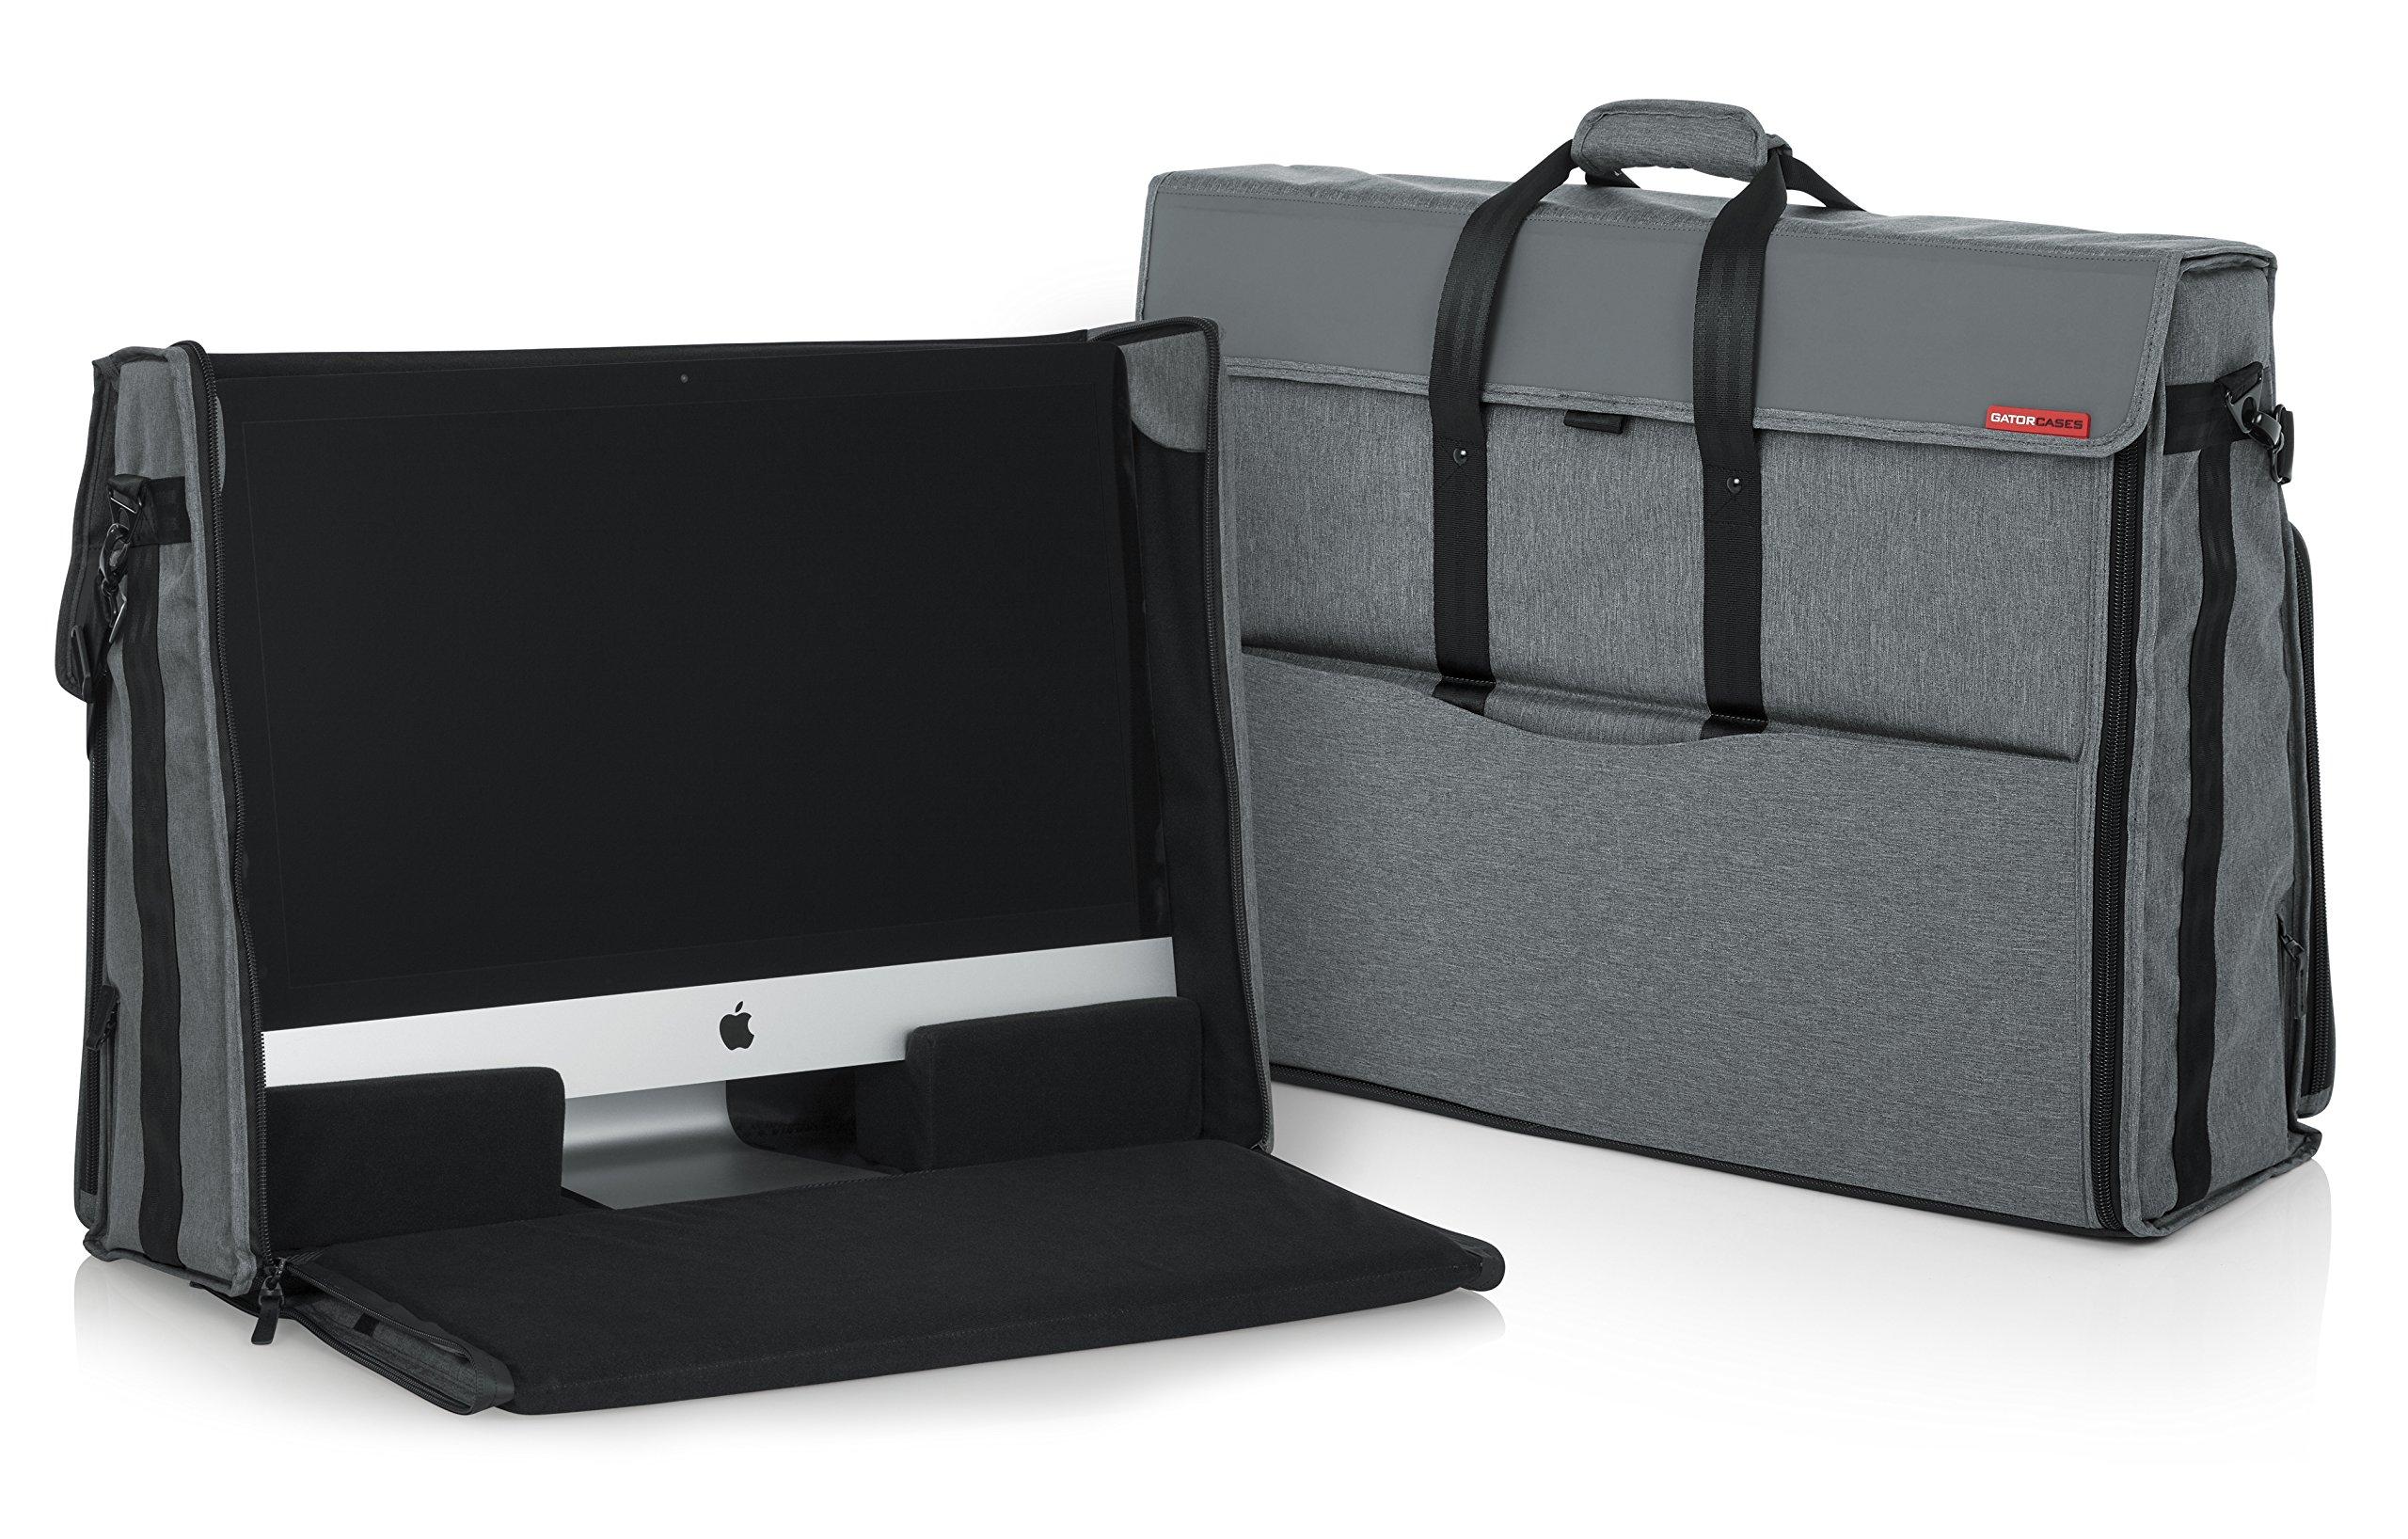 Gator Cases Creative Pro Series Nylon Carry Tote Bag for Apple 27'' iMac Desktop Computer (G-CPR-IM27)